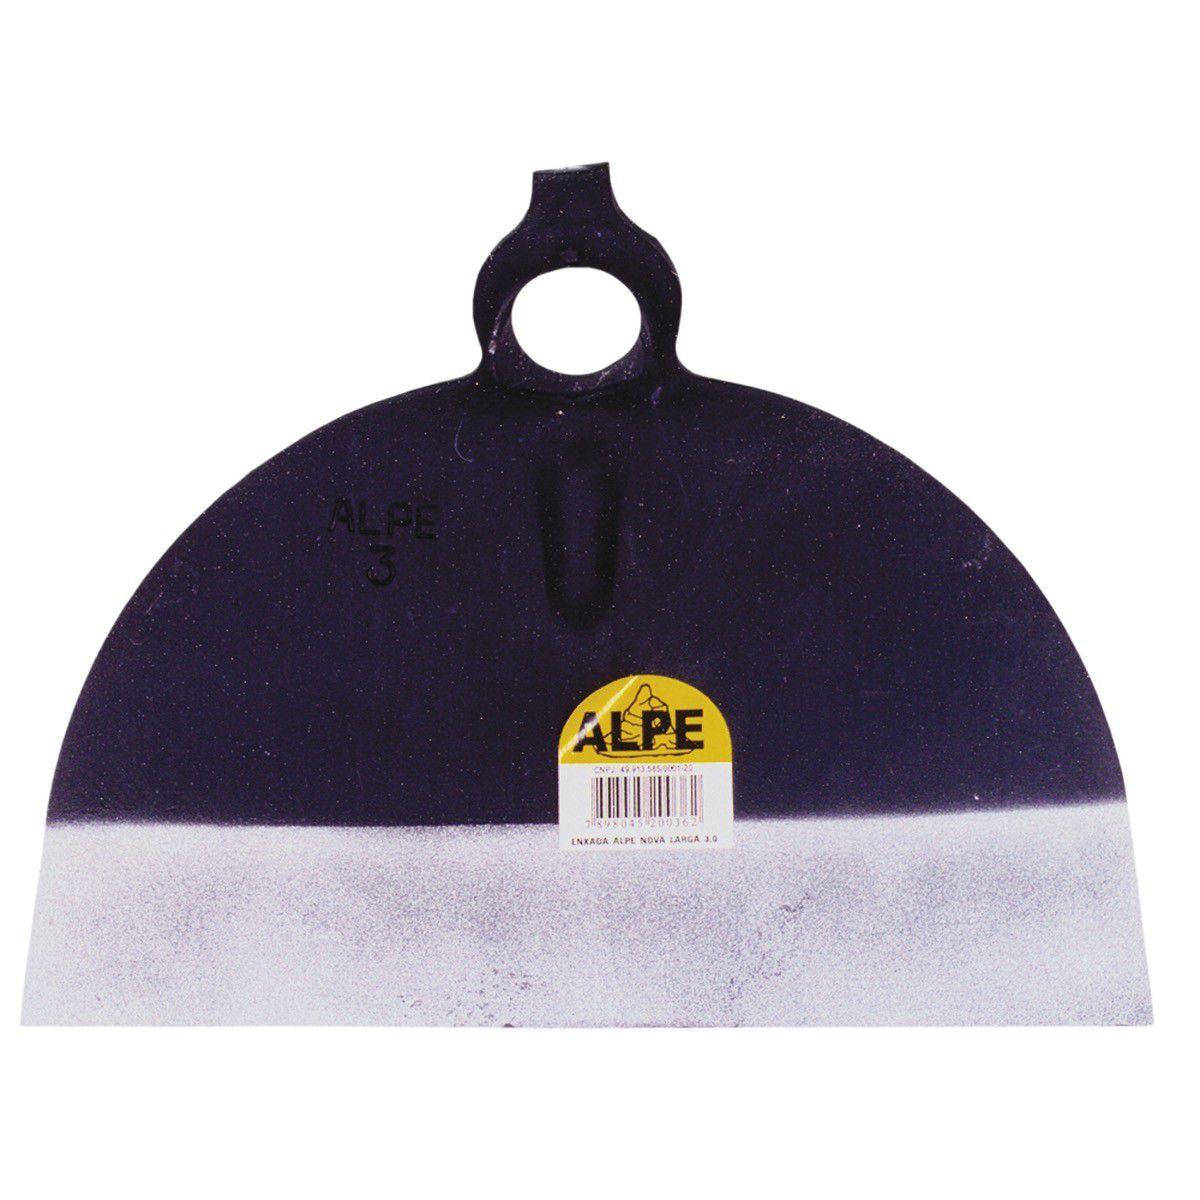 Enxada Alpe Nova S/ Solda 2,0 Libras Larga Cx/6